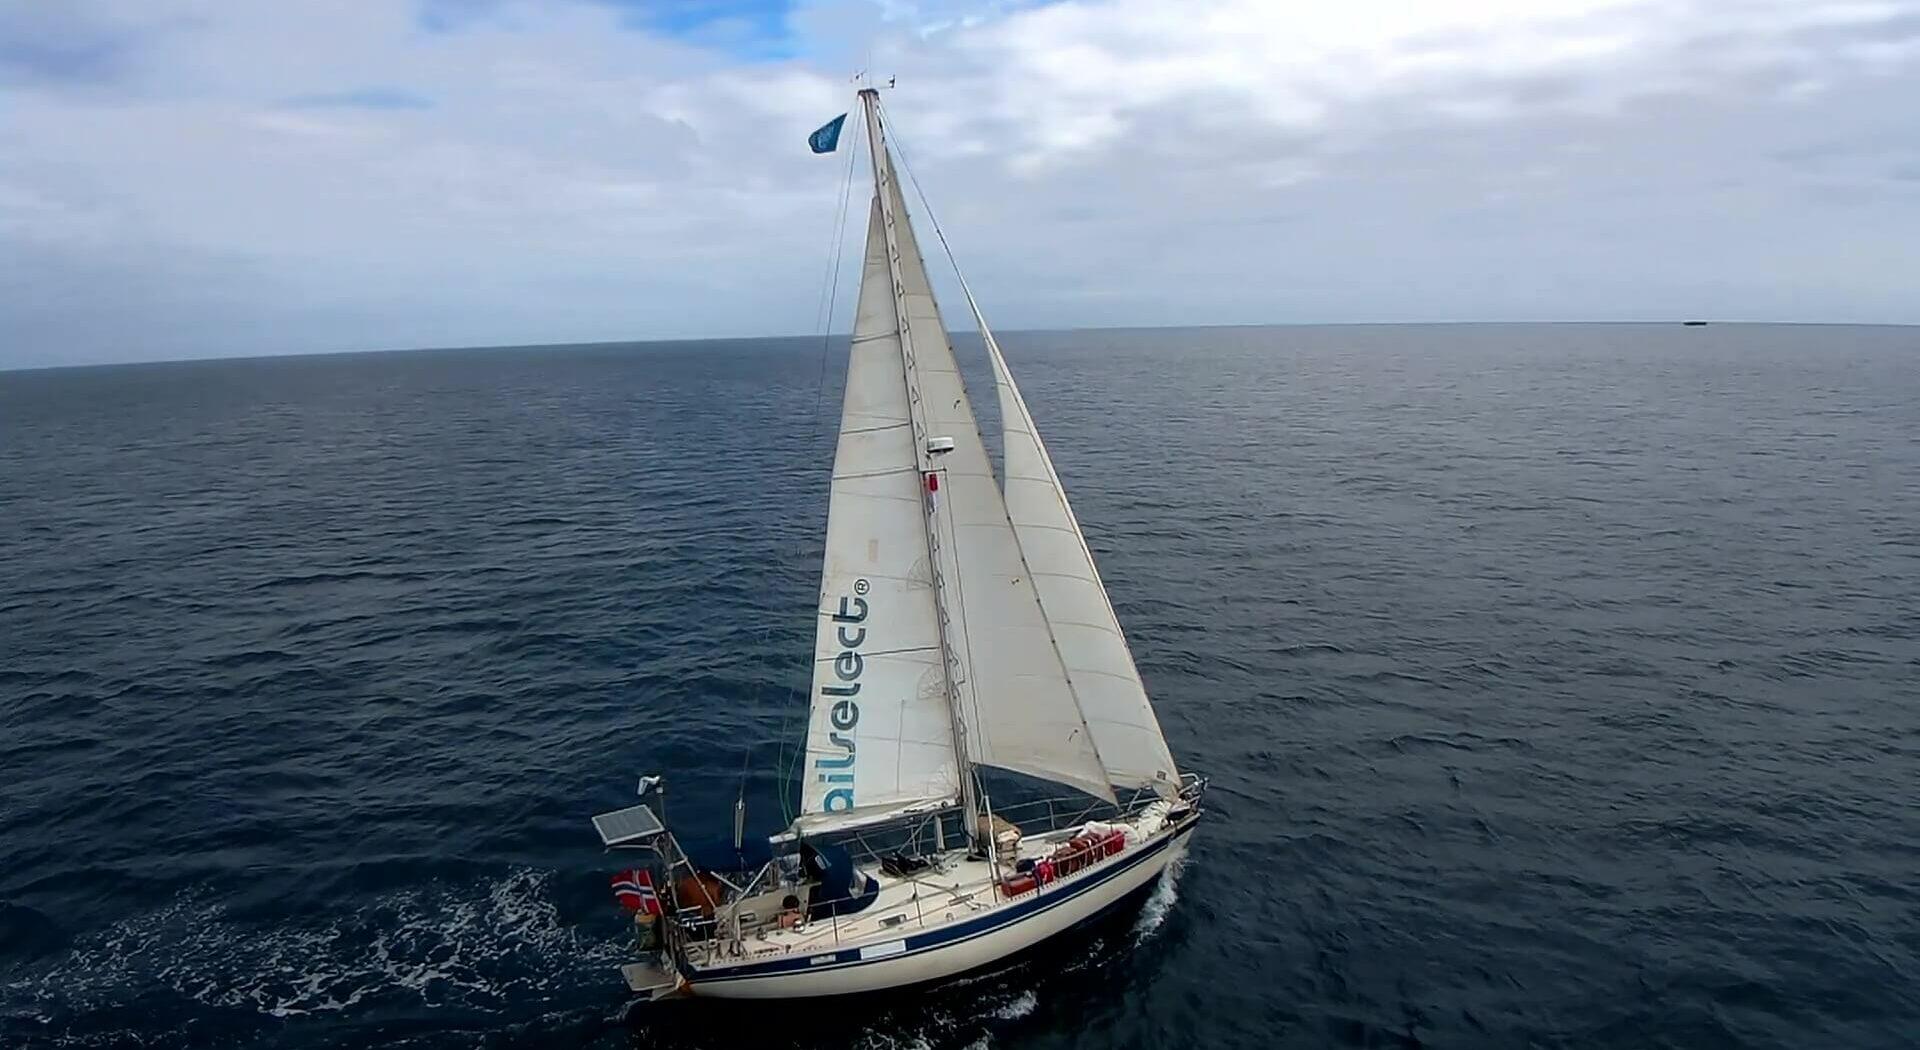 »Amanda» på vei mot nye horisonter. Droneshotꓽ Amanda Sailing